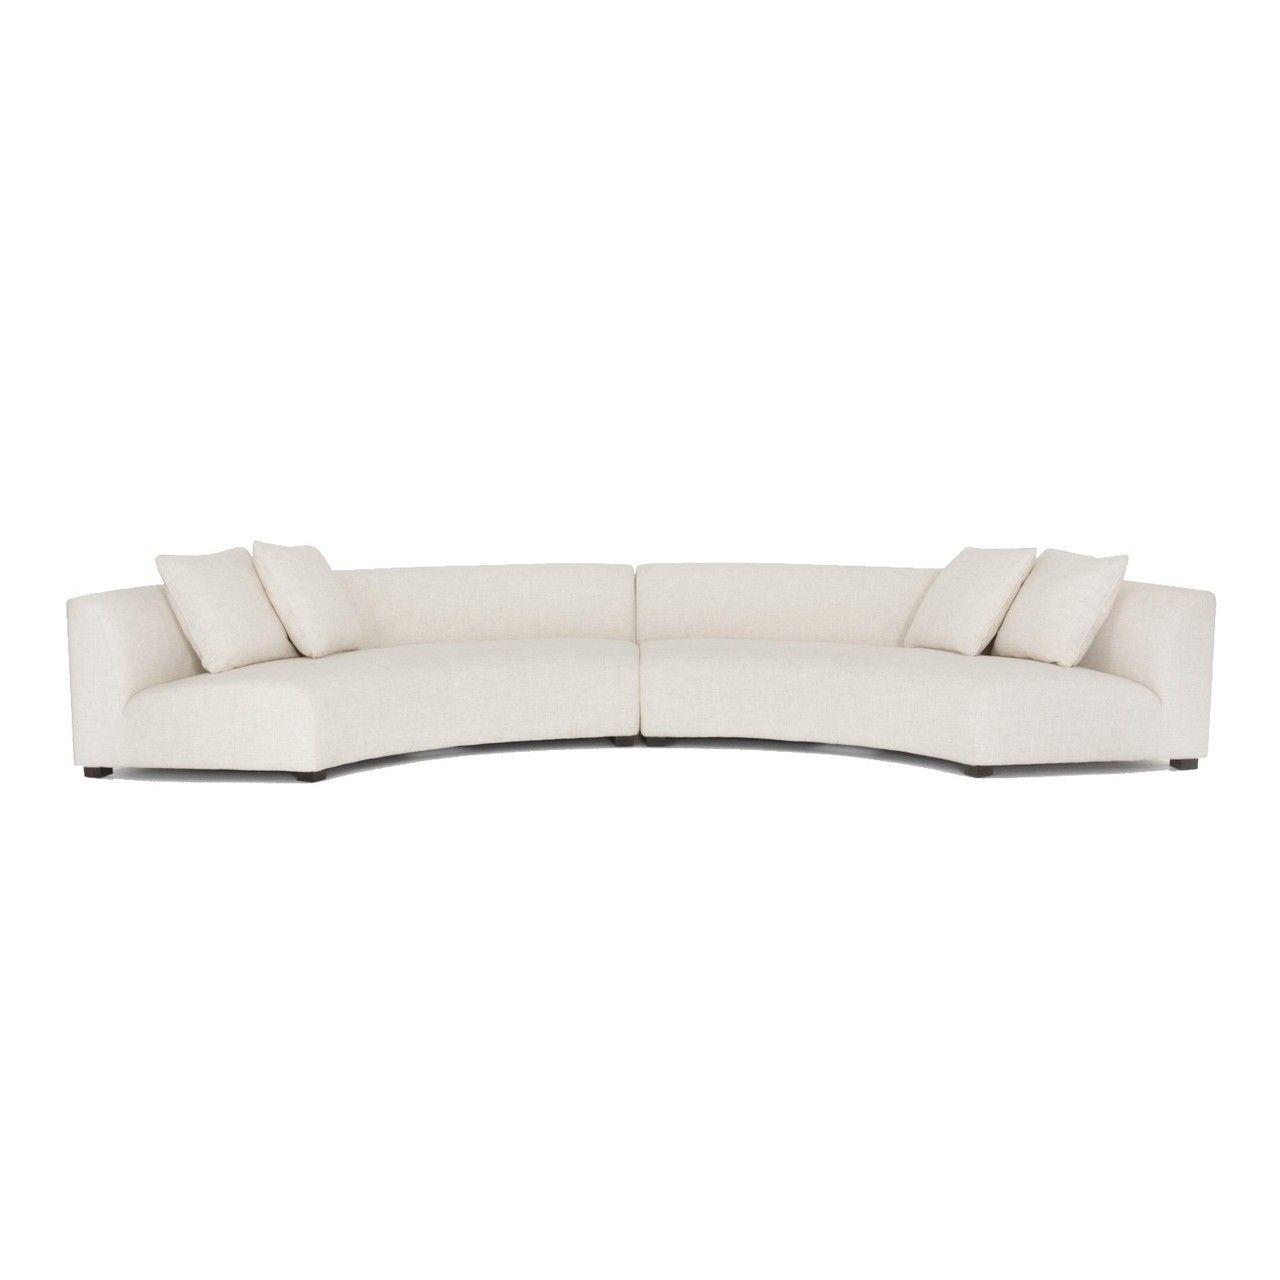 Liam Modern Cream 2 Piece Curved Sectional Sofa Sectional Sofa